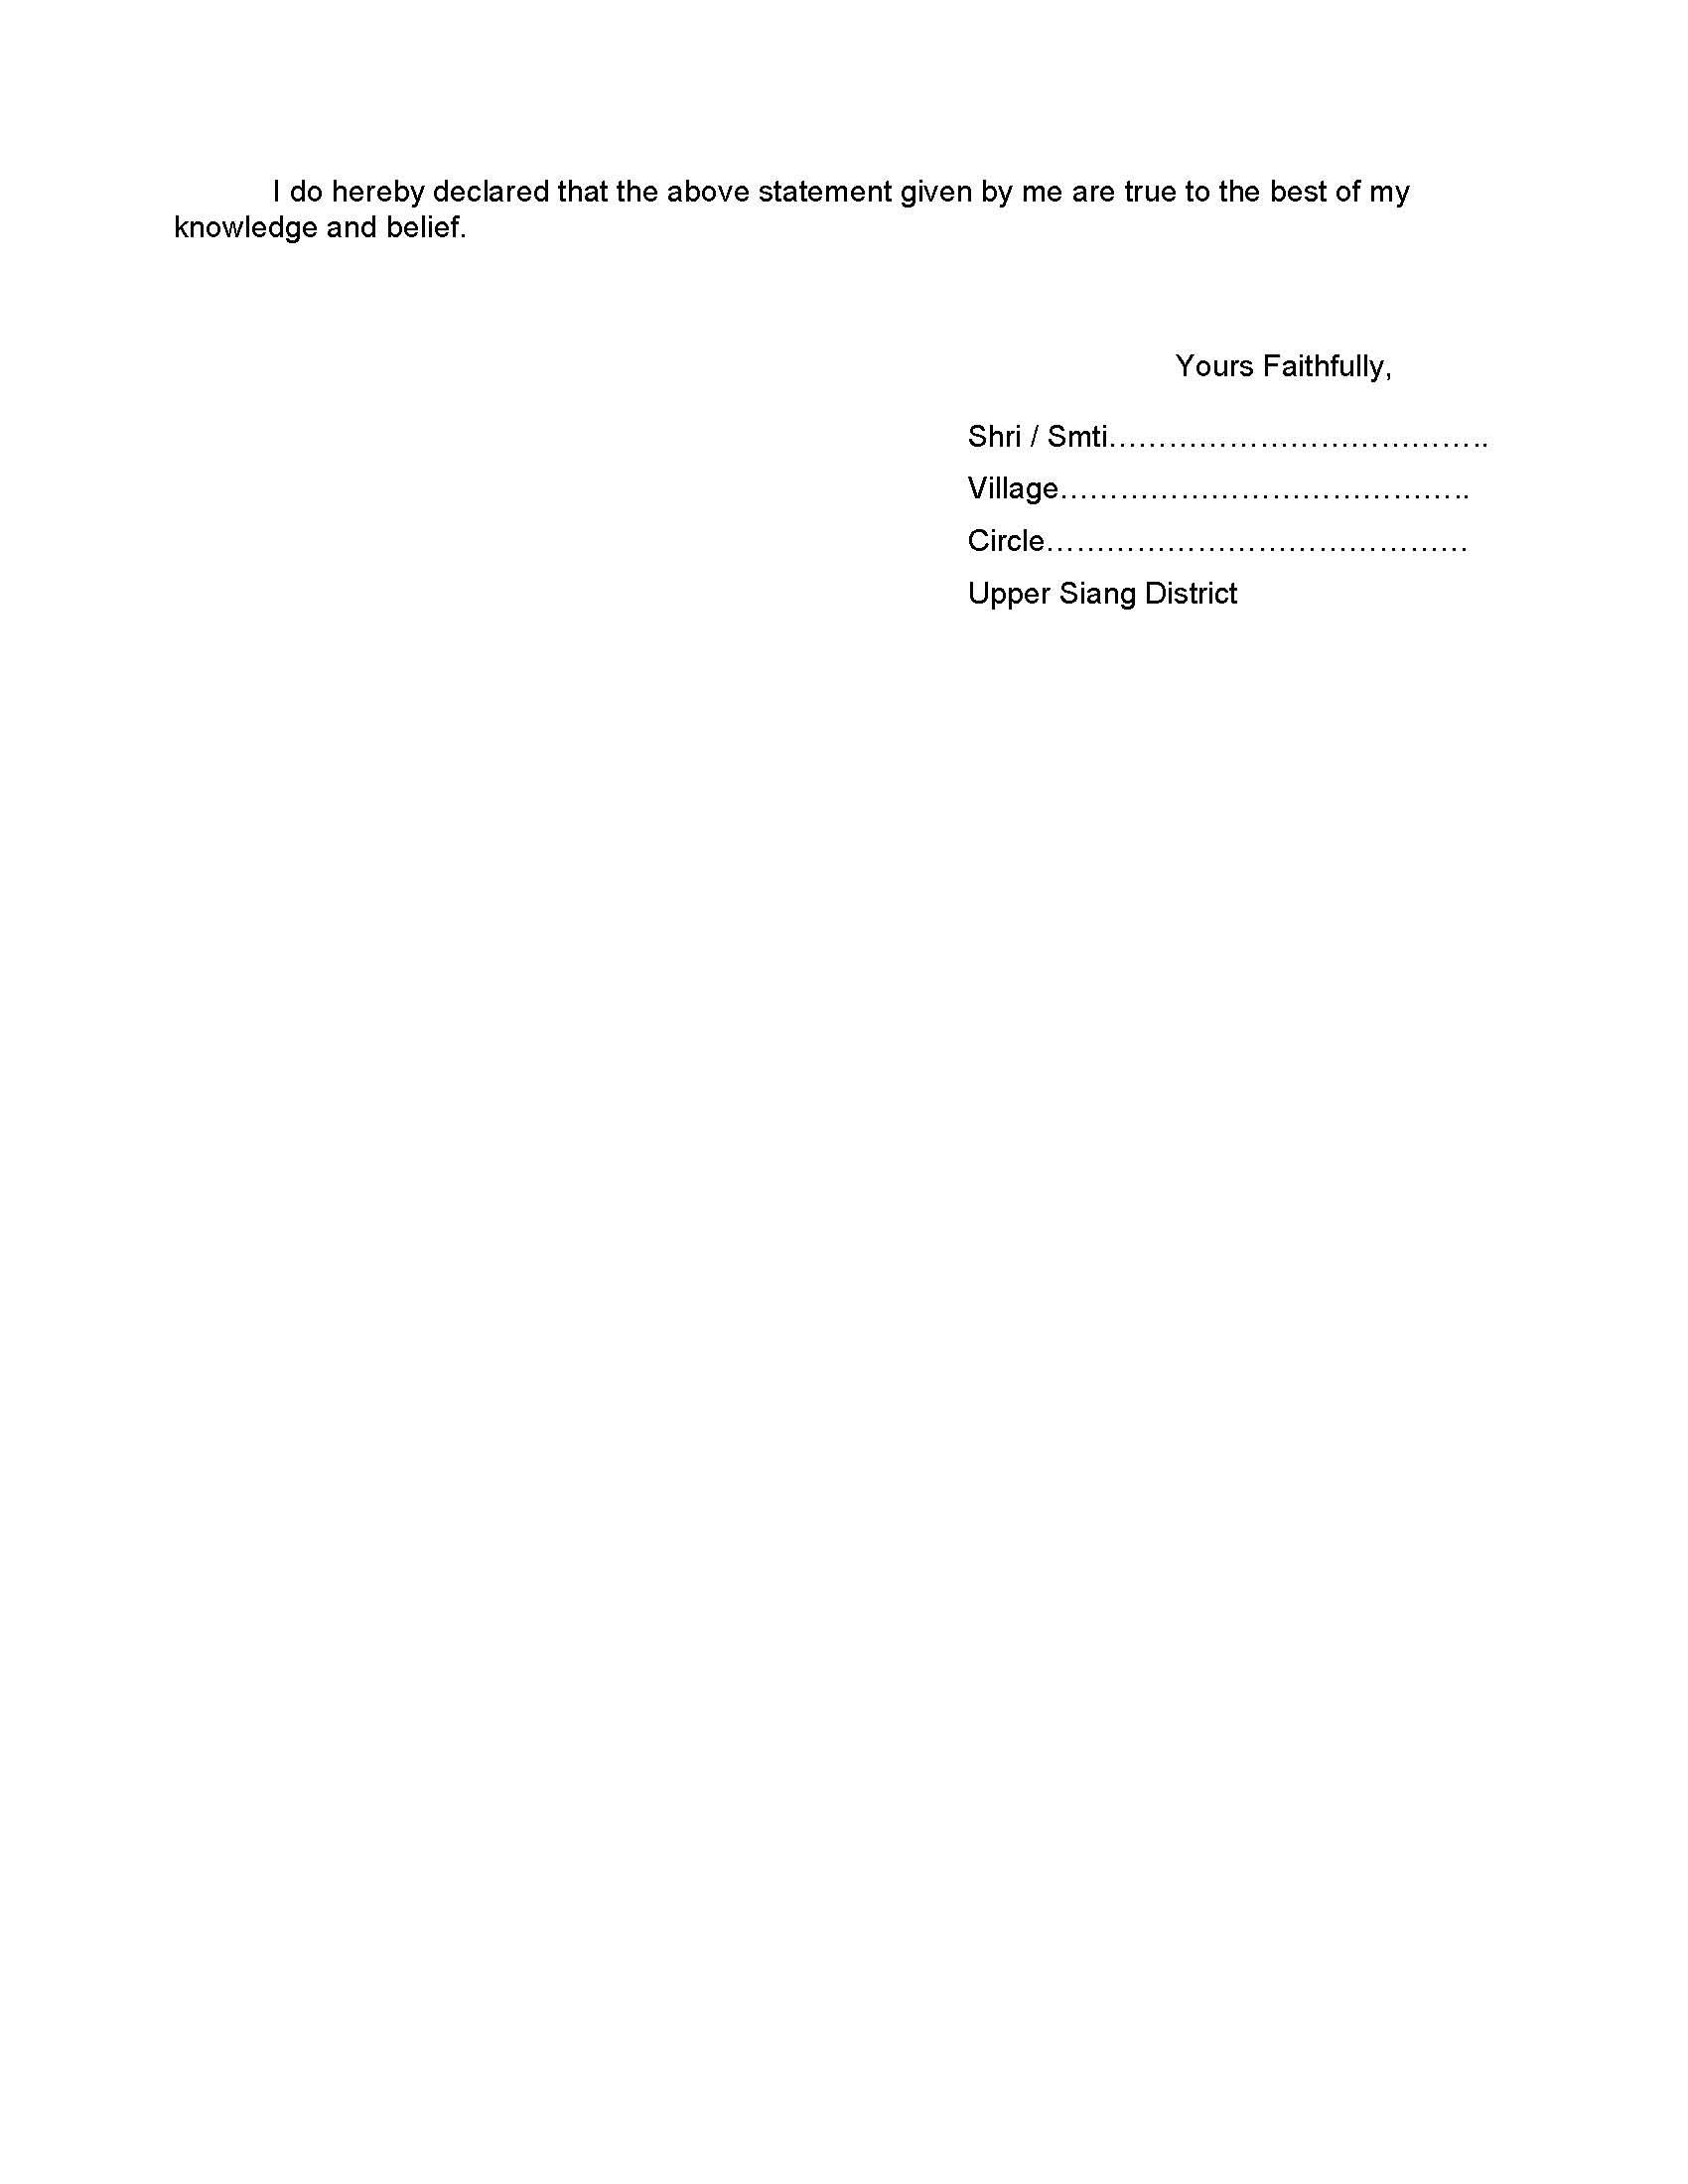 How to Obtain Land Possession Certificate (LPC) - TaiyariJeetKi